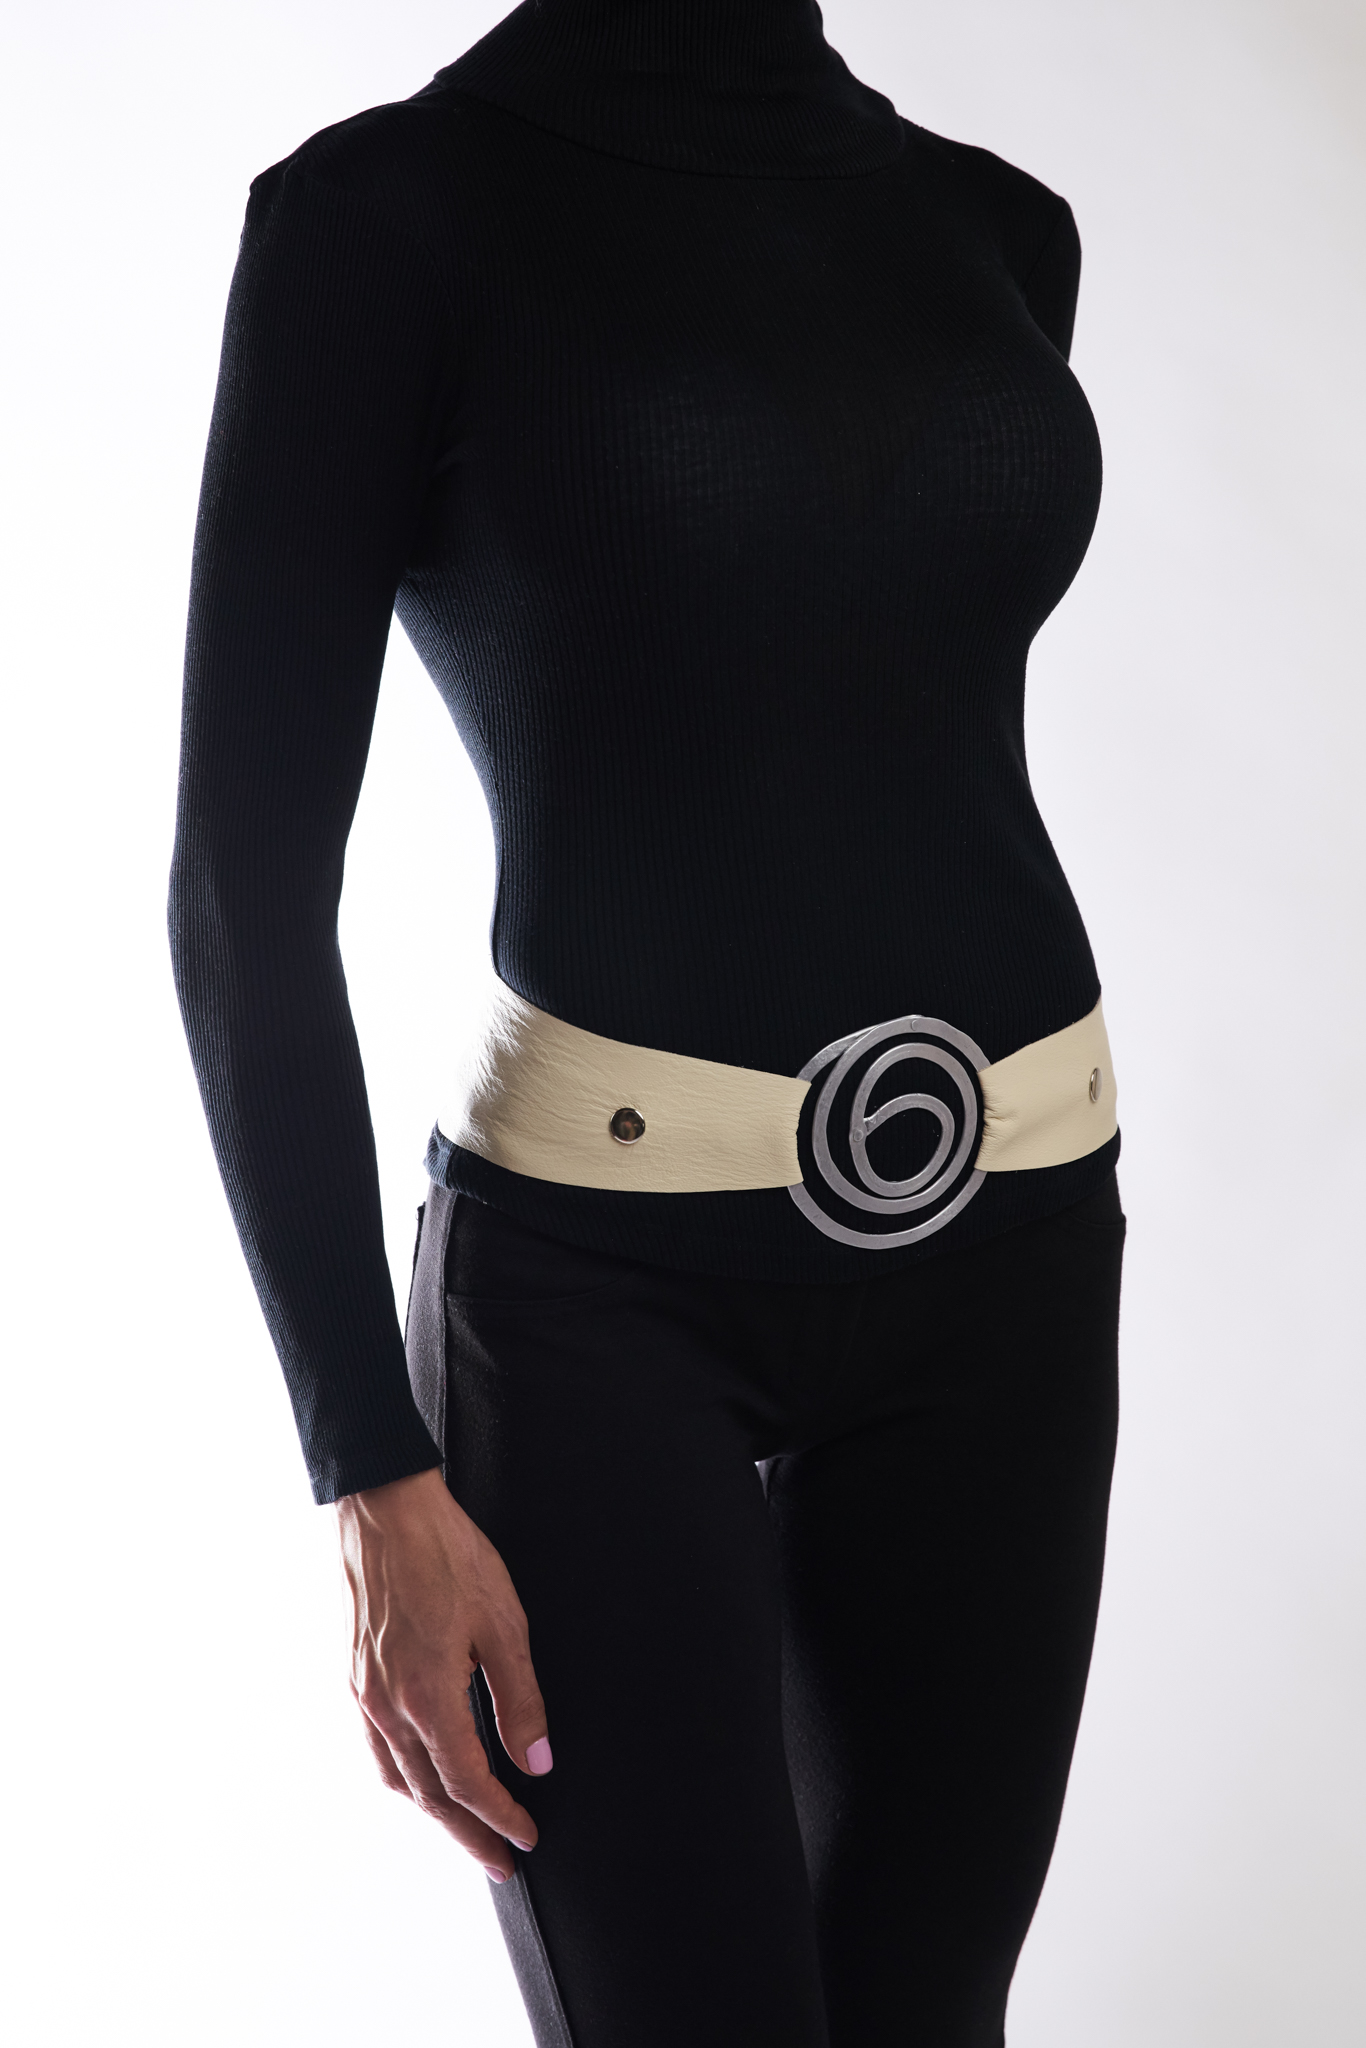 A trochanteric belt